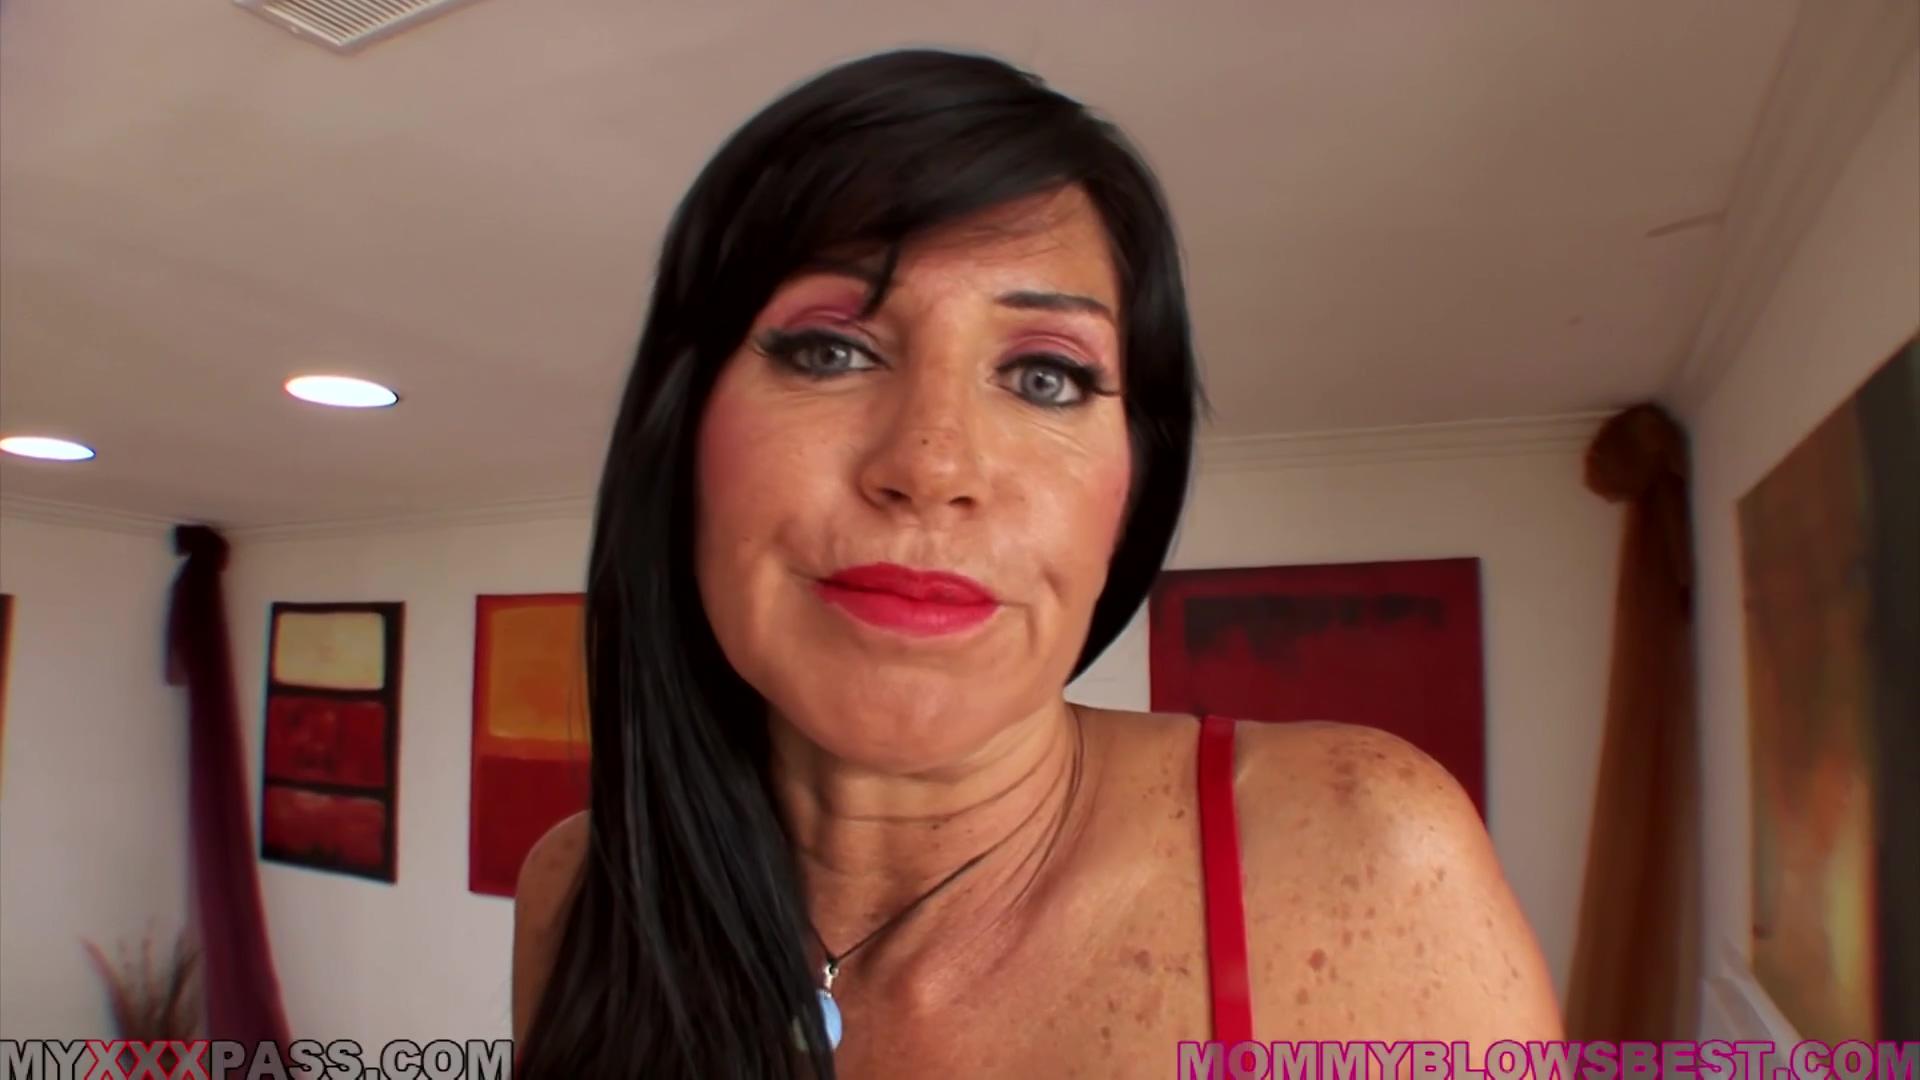 Video 1330002804: tara holiday, milf pov cum, big tits milf pov, milf pov hd, brunette milf pov, milf swallows cum, milf loves cock